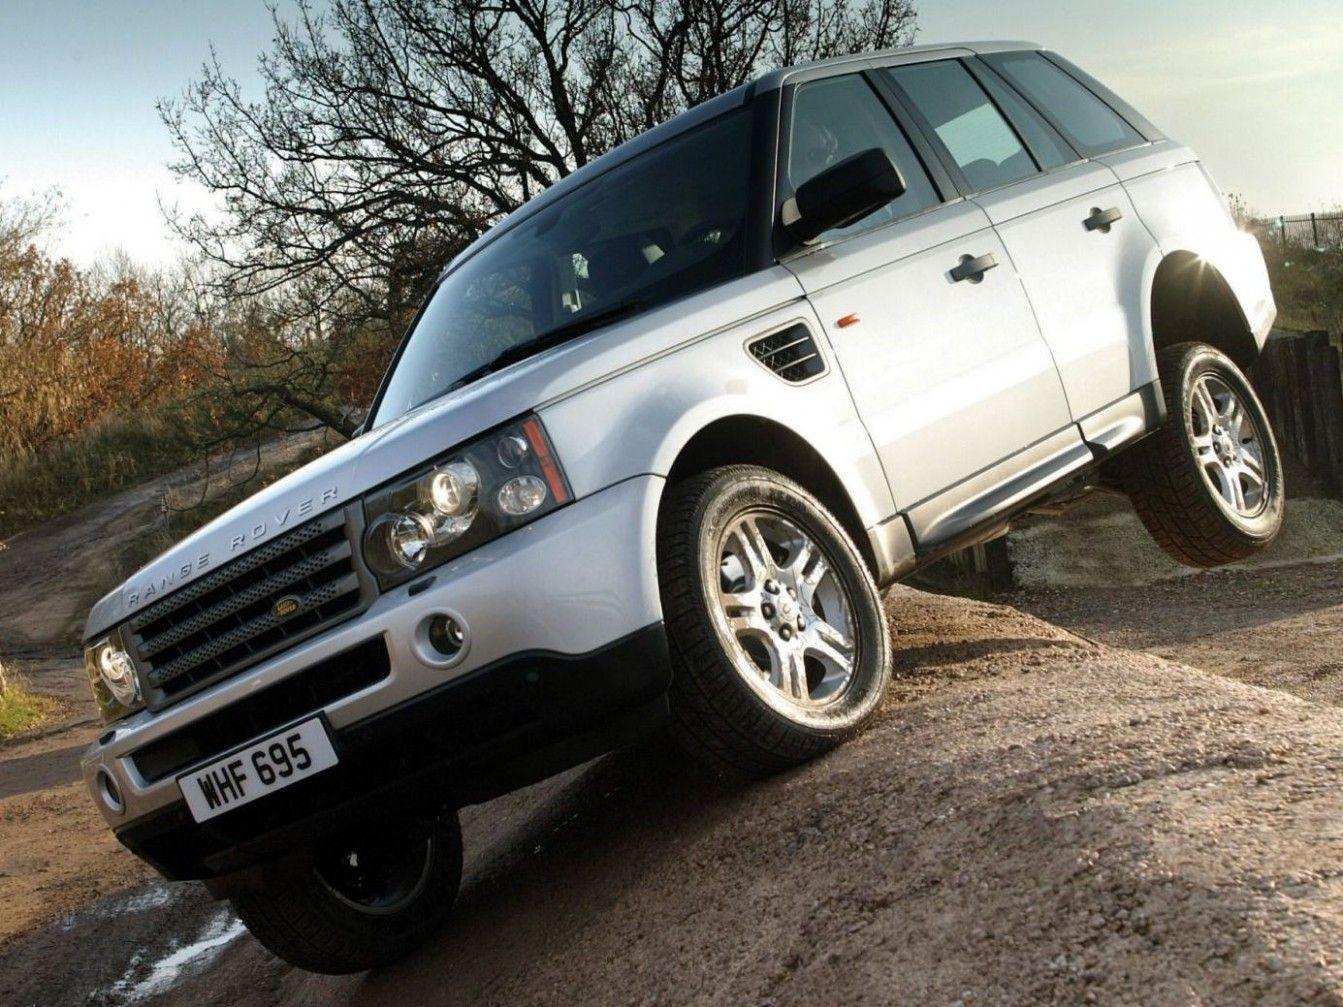 Range Rover Sport Harga in 2020 Range rover sport, Range